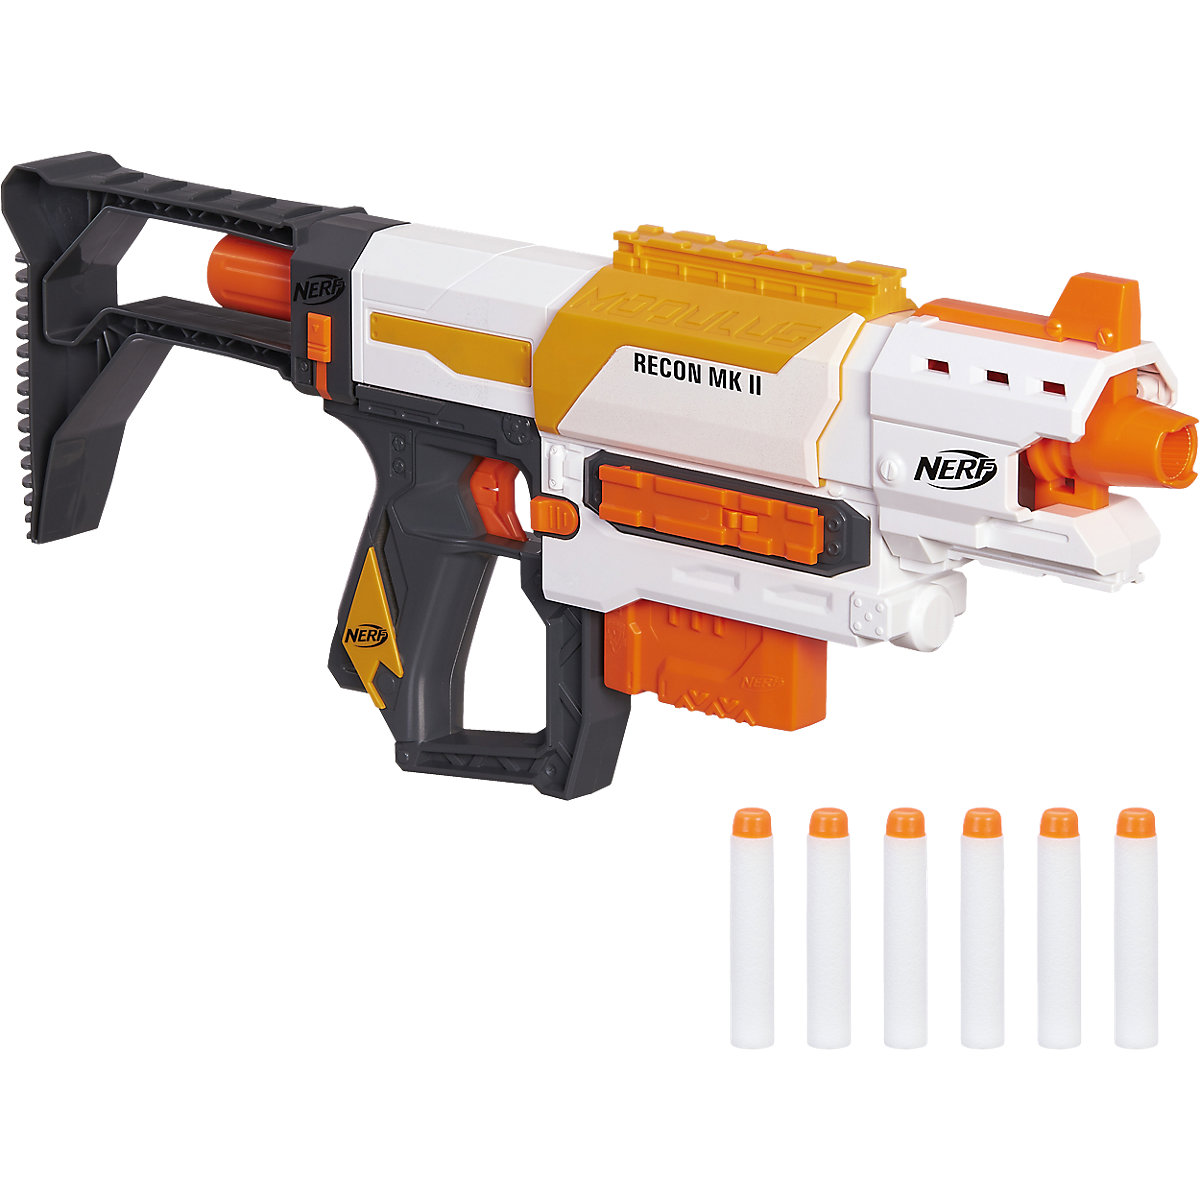 NERF jouet pistolets 4326309 pistolet arme jouets jeux pneumatique blaster garçon orbiz revolver plein air plaisir sport MTpromo